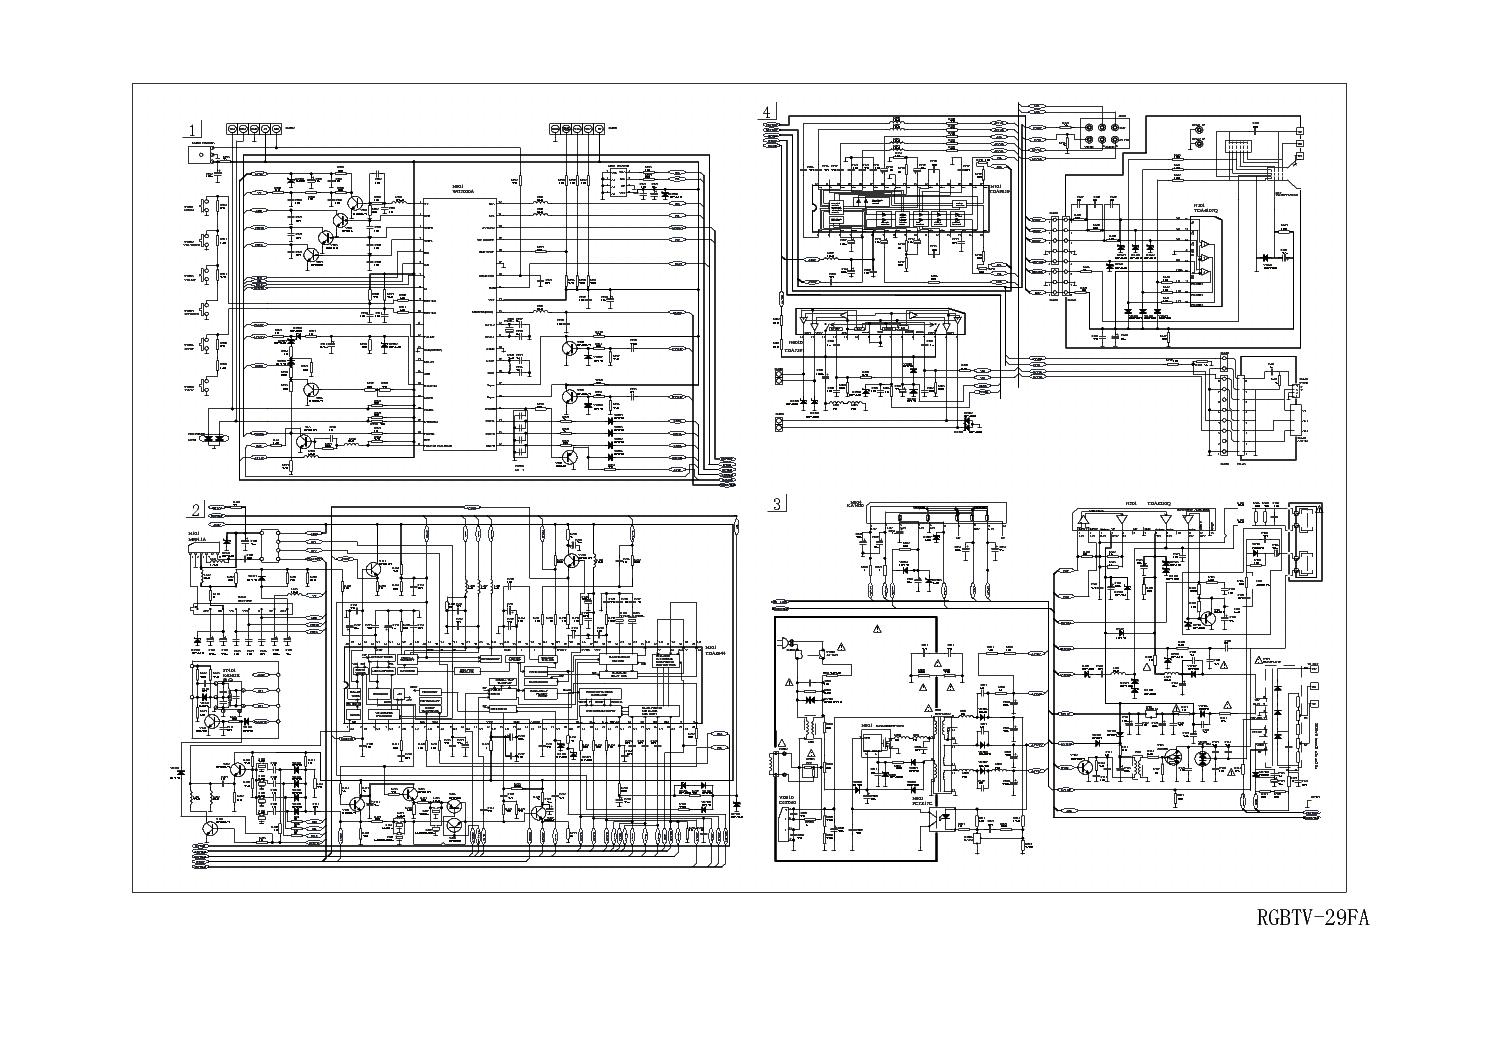 Haier Tv Circuit Board Diagrams Schematics Pdf Service Manuals Fault Codes Smart Tv Service Manuals Repair Cir Circuit Diagram Diagram Schematic Drawing